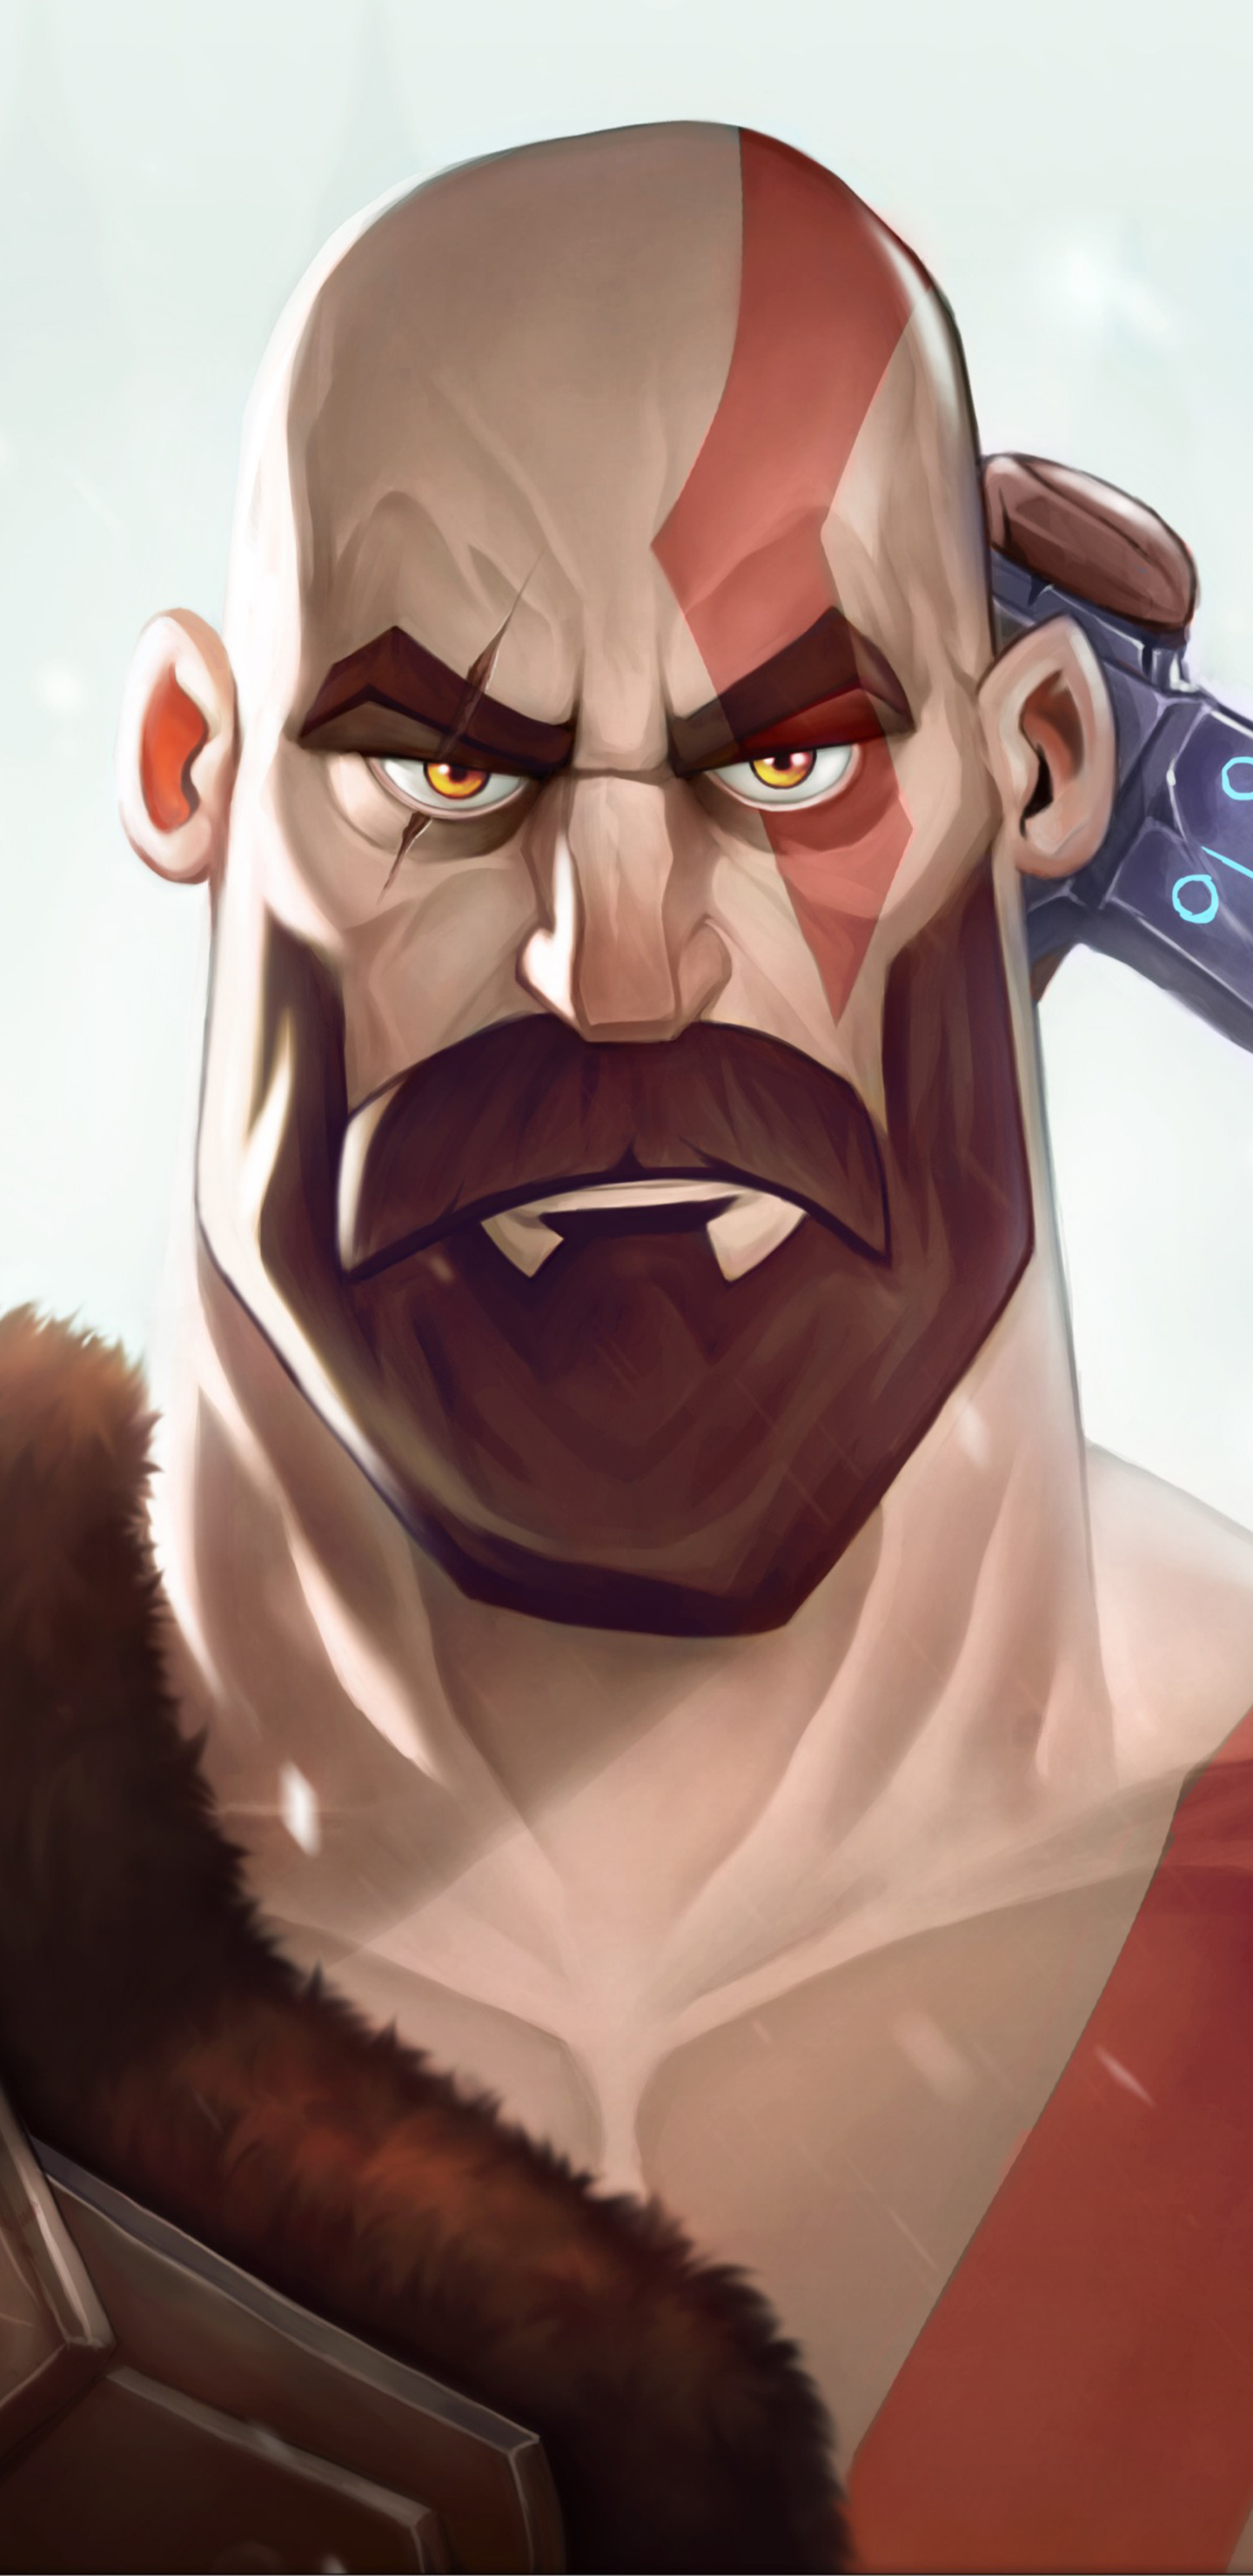 kratos-god-of-war-illustration-ob.jpg